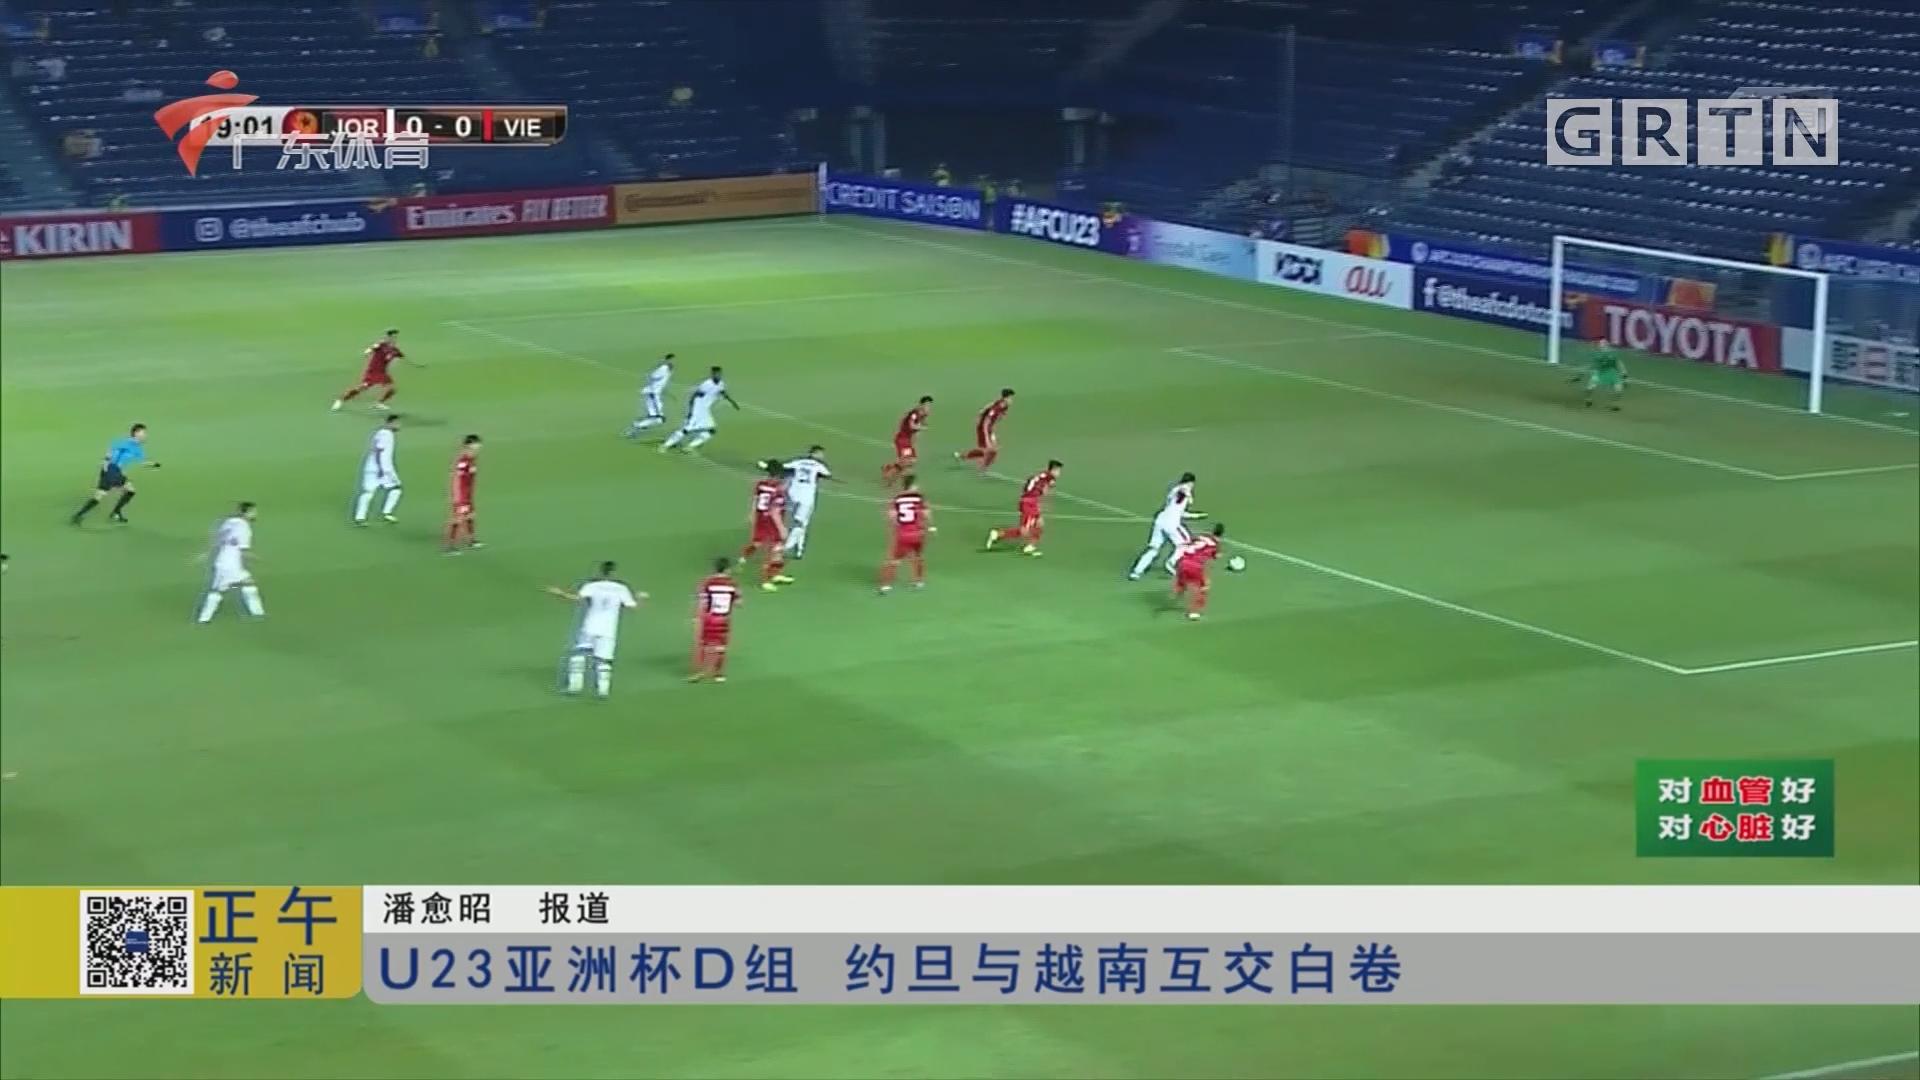 U23亚洲杯D组 约旦与越南互交白卷